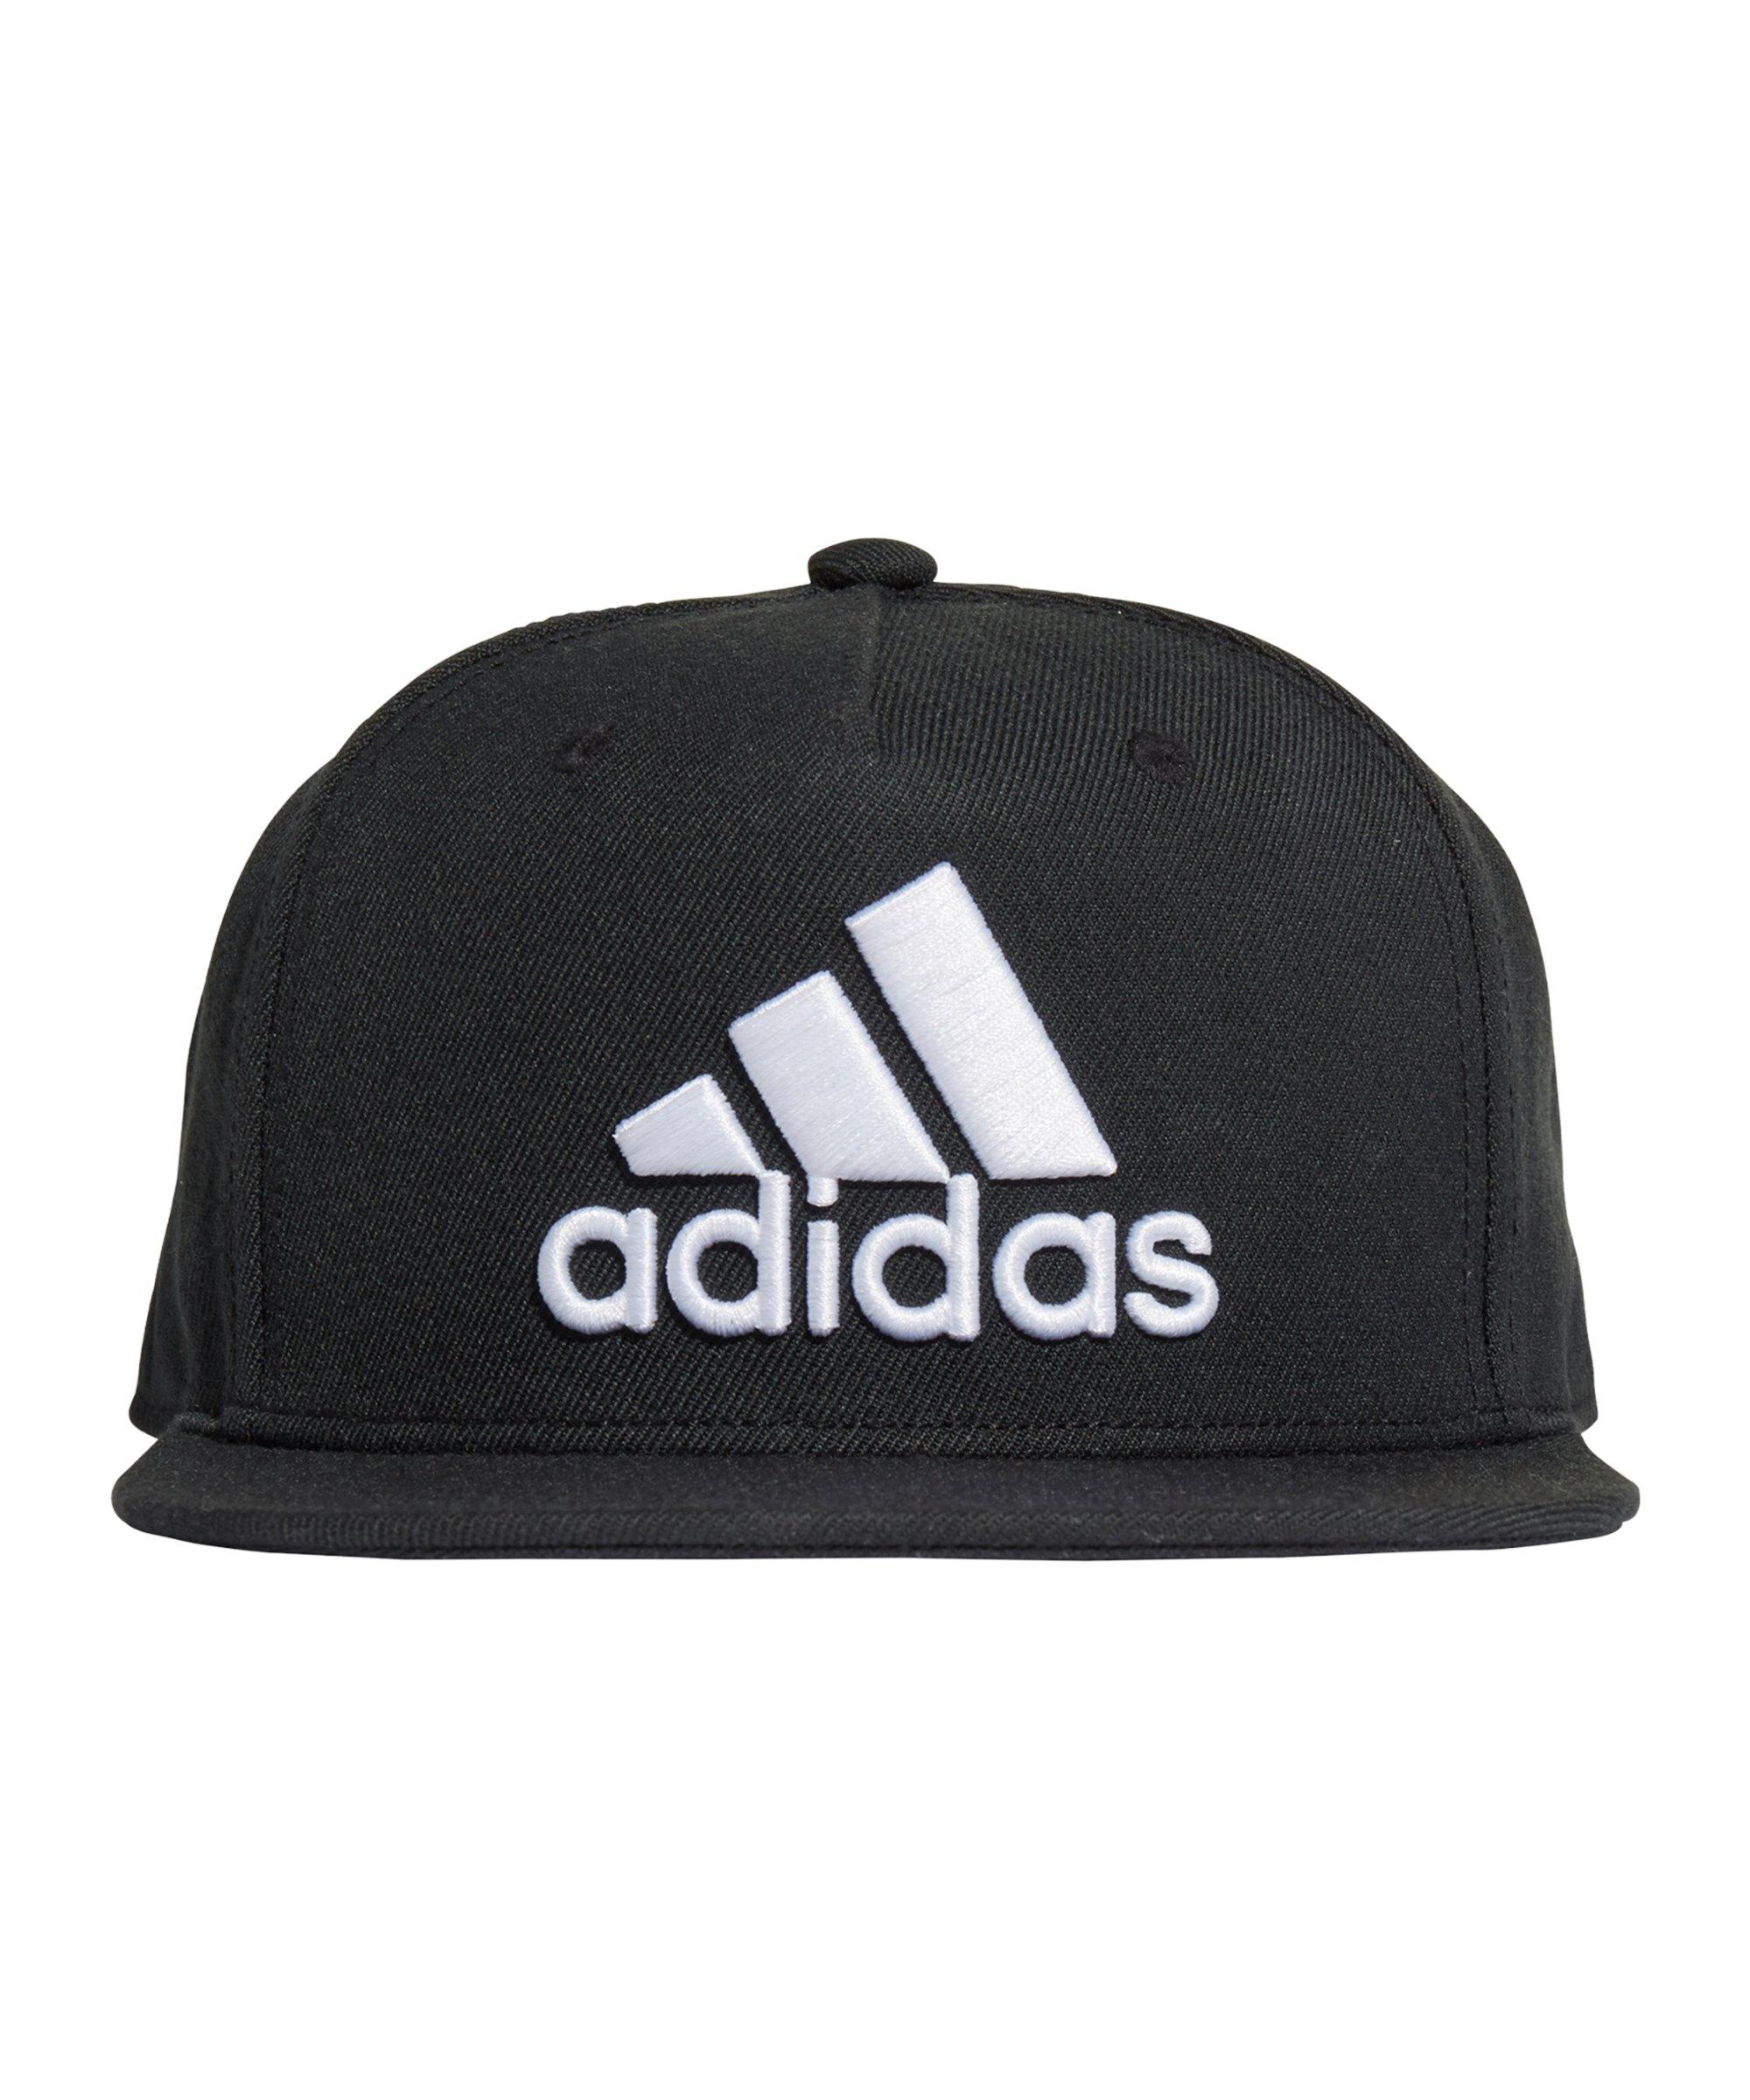 adidas Snapback Logo Cap Schwarz - schwarz